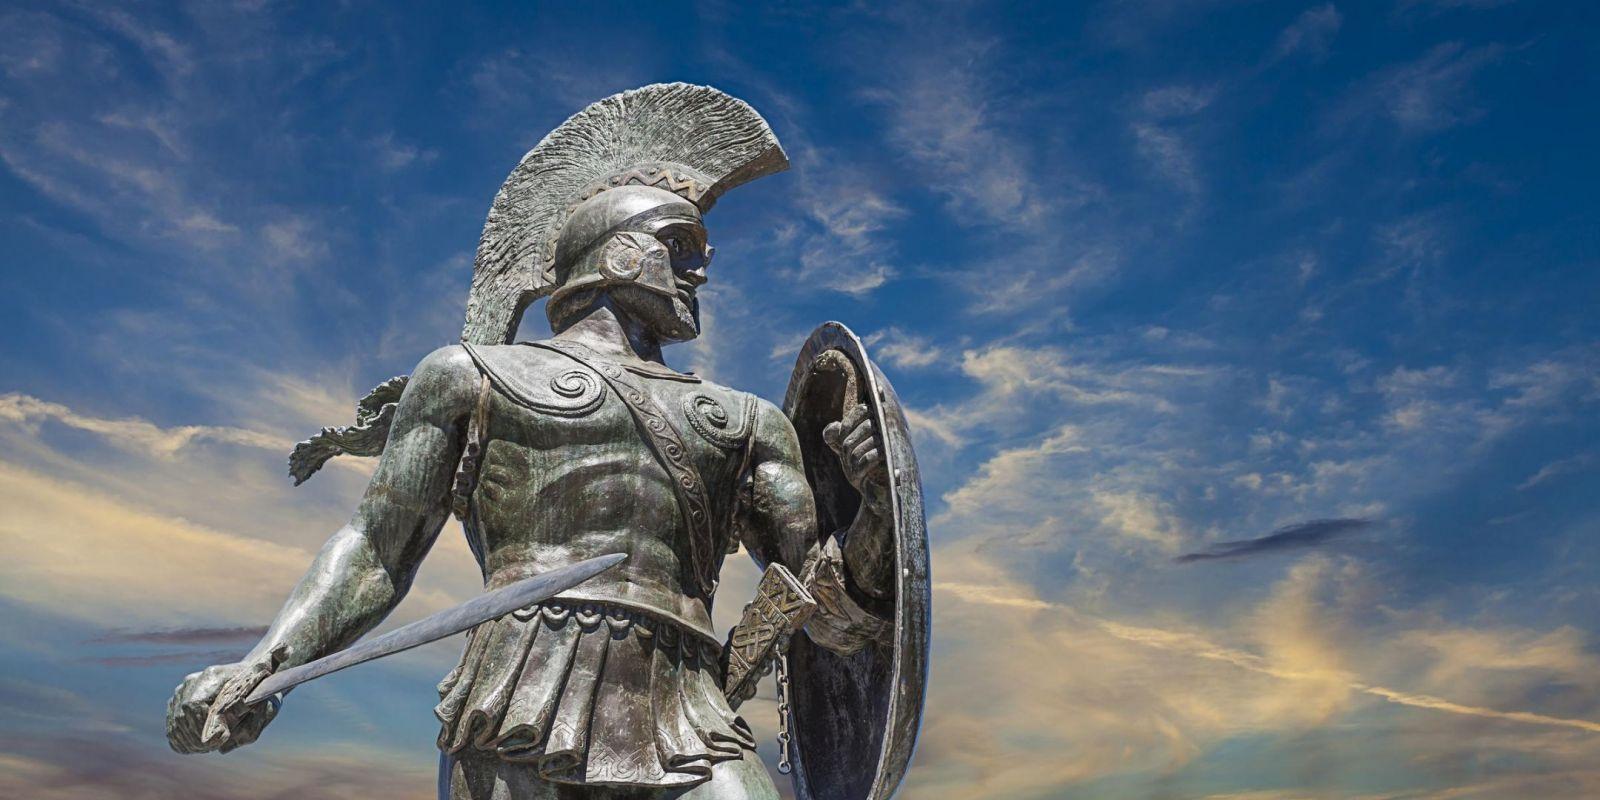 Sparta, Greece - Explore Greece by off-season 16 days tour from Igoumenitsa. UNESCO sites, fortresses, monasteries. Small group tour from Monterrasol Travel by car.